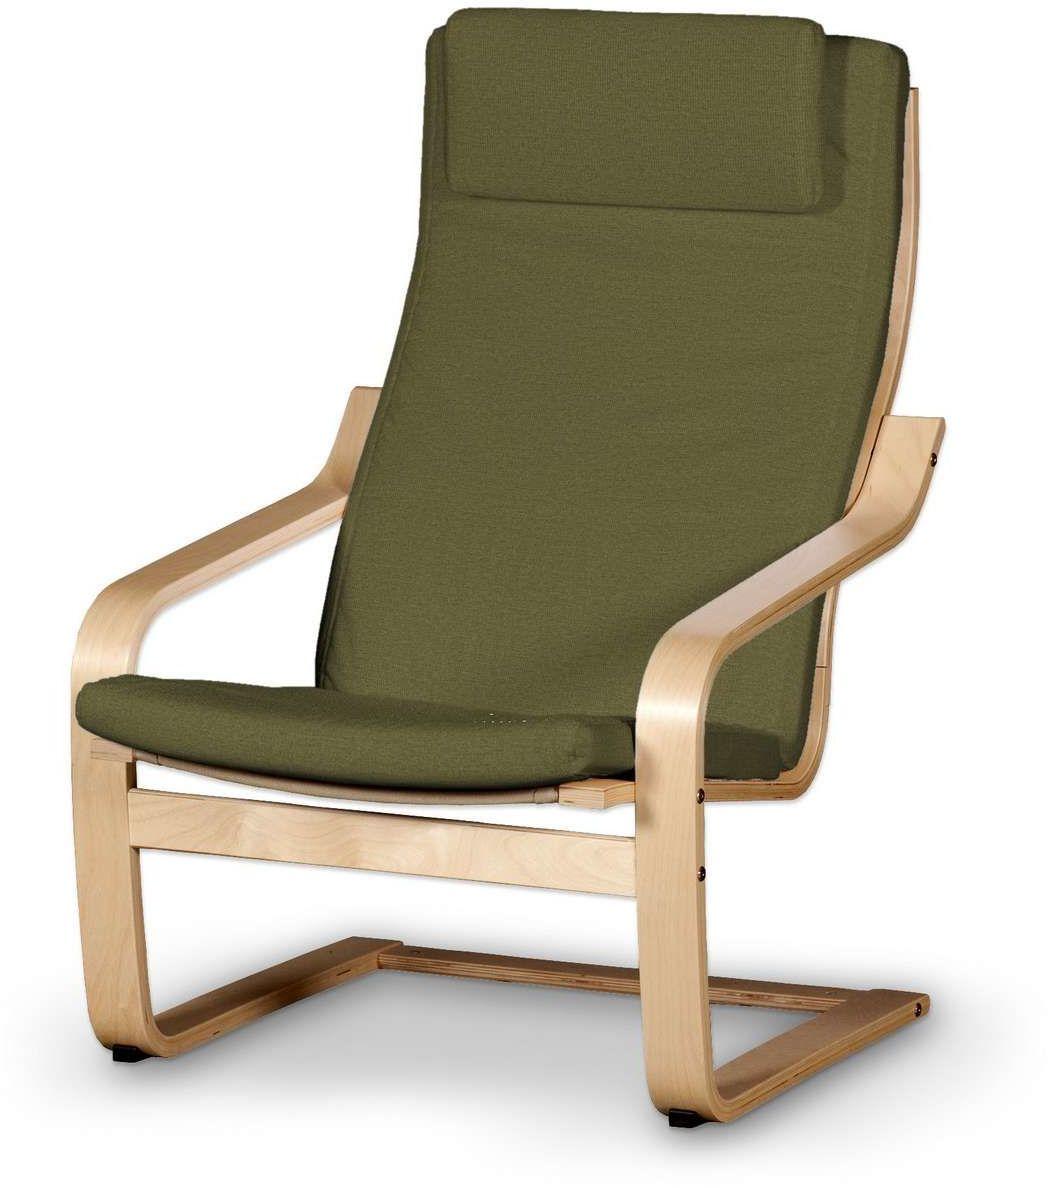 Poduszka na fotel Poäng II, oliwkowa zieleń, Fotel Poäng II, Etna